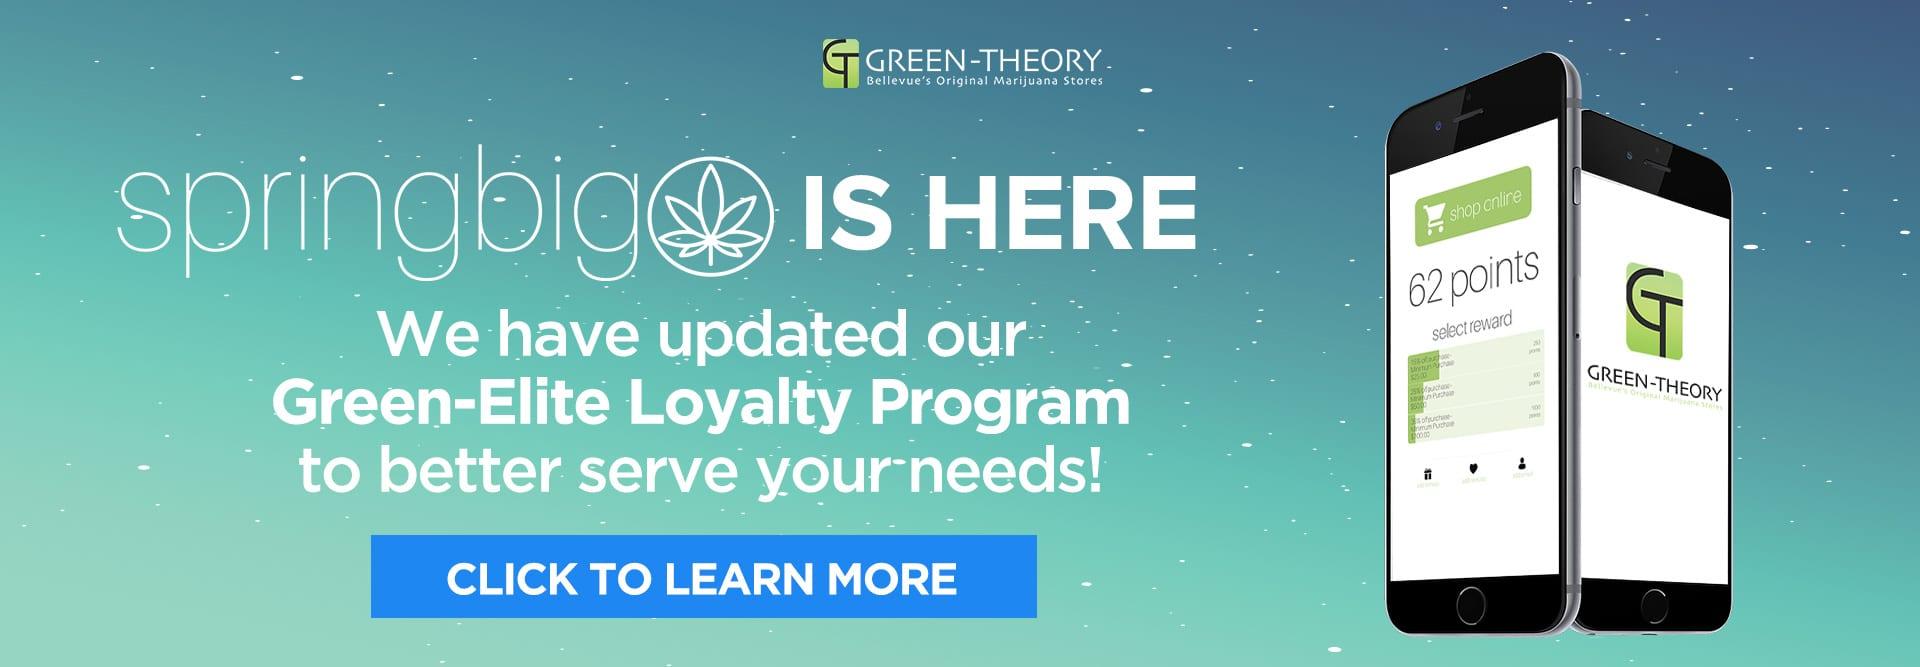 bellevue-cannabis-rewards-program-spring-big-green-theory